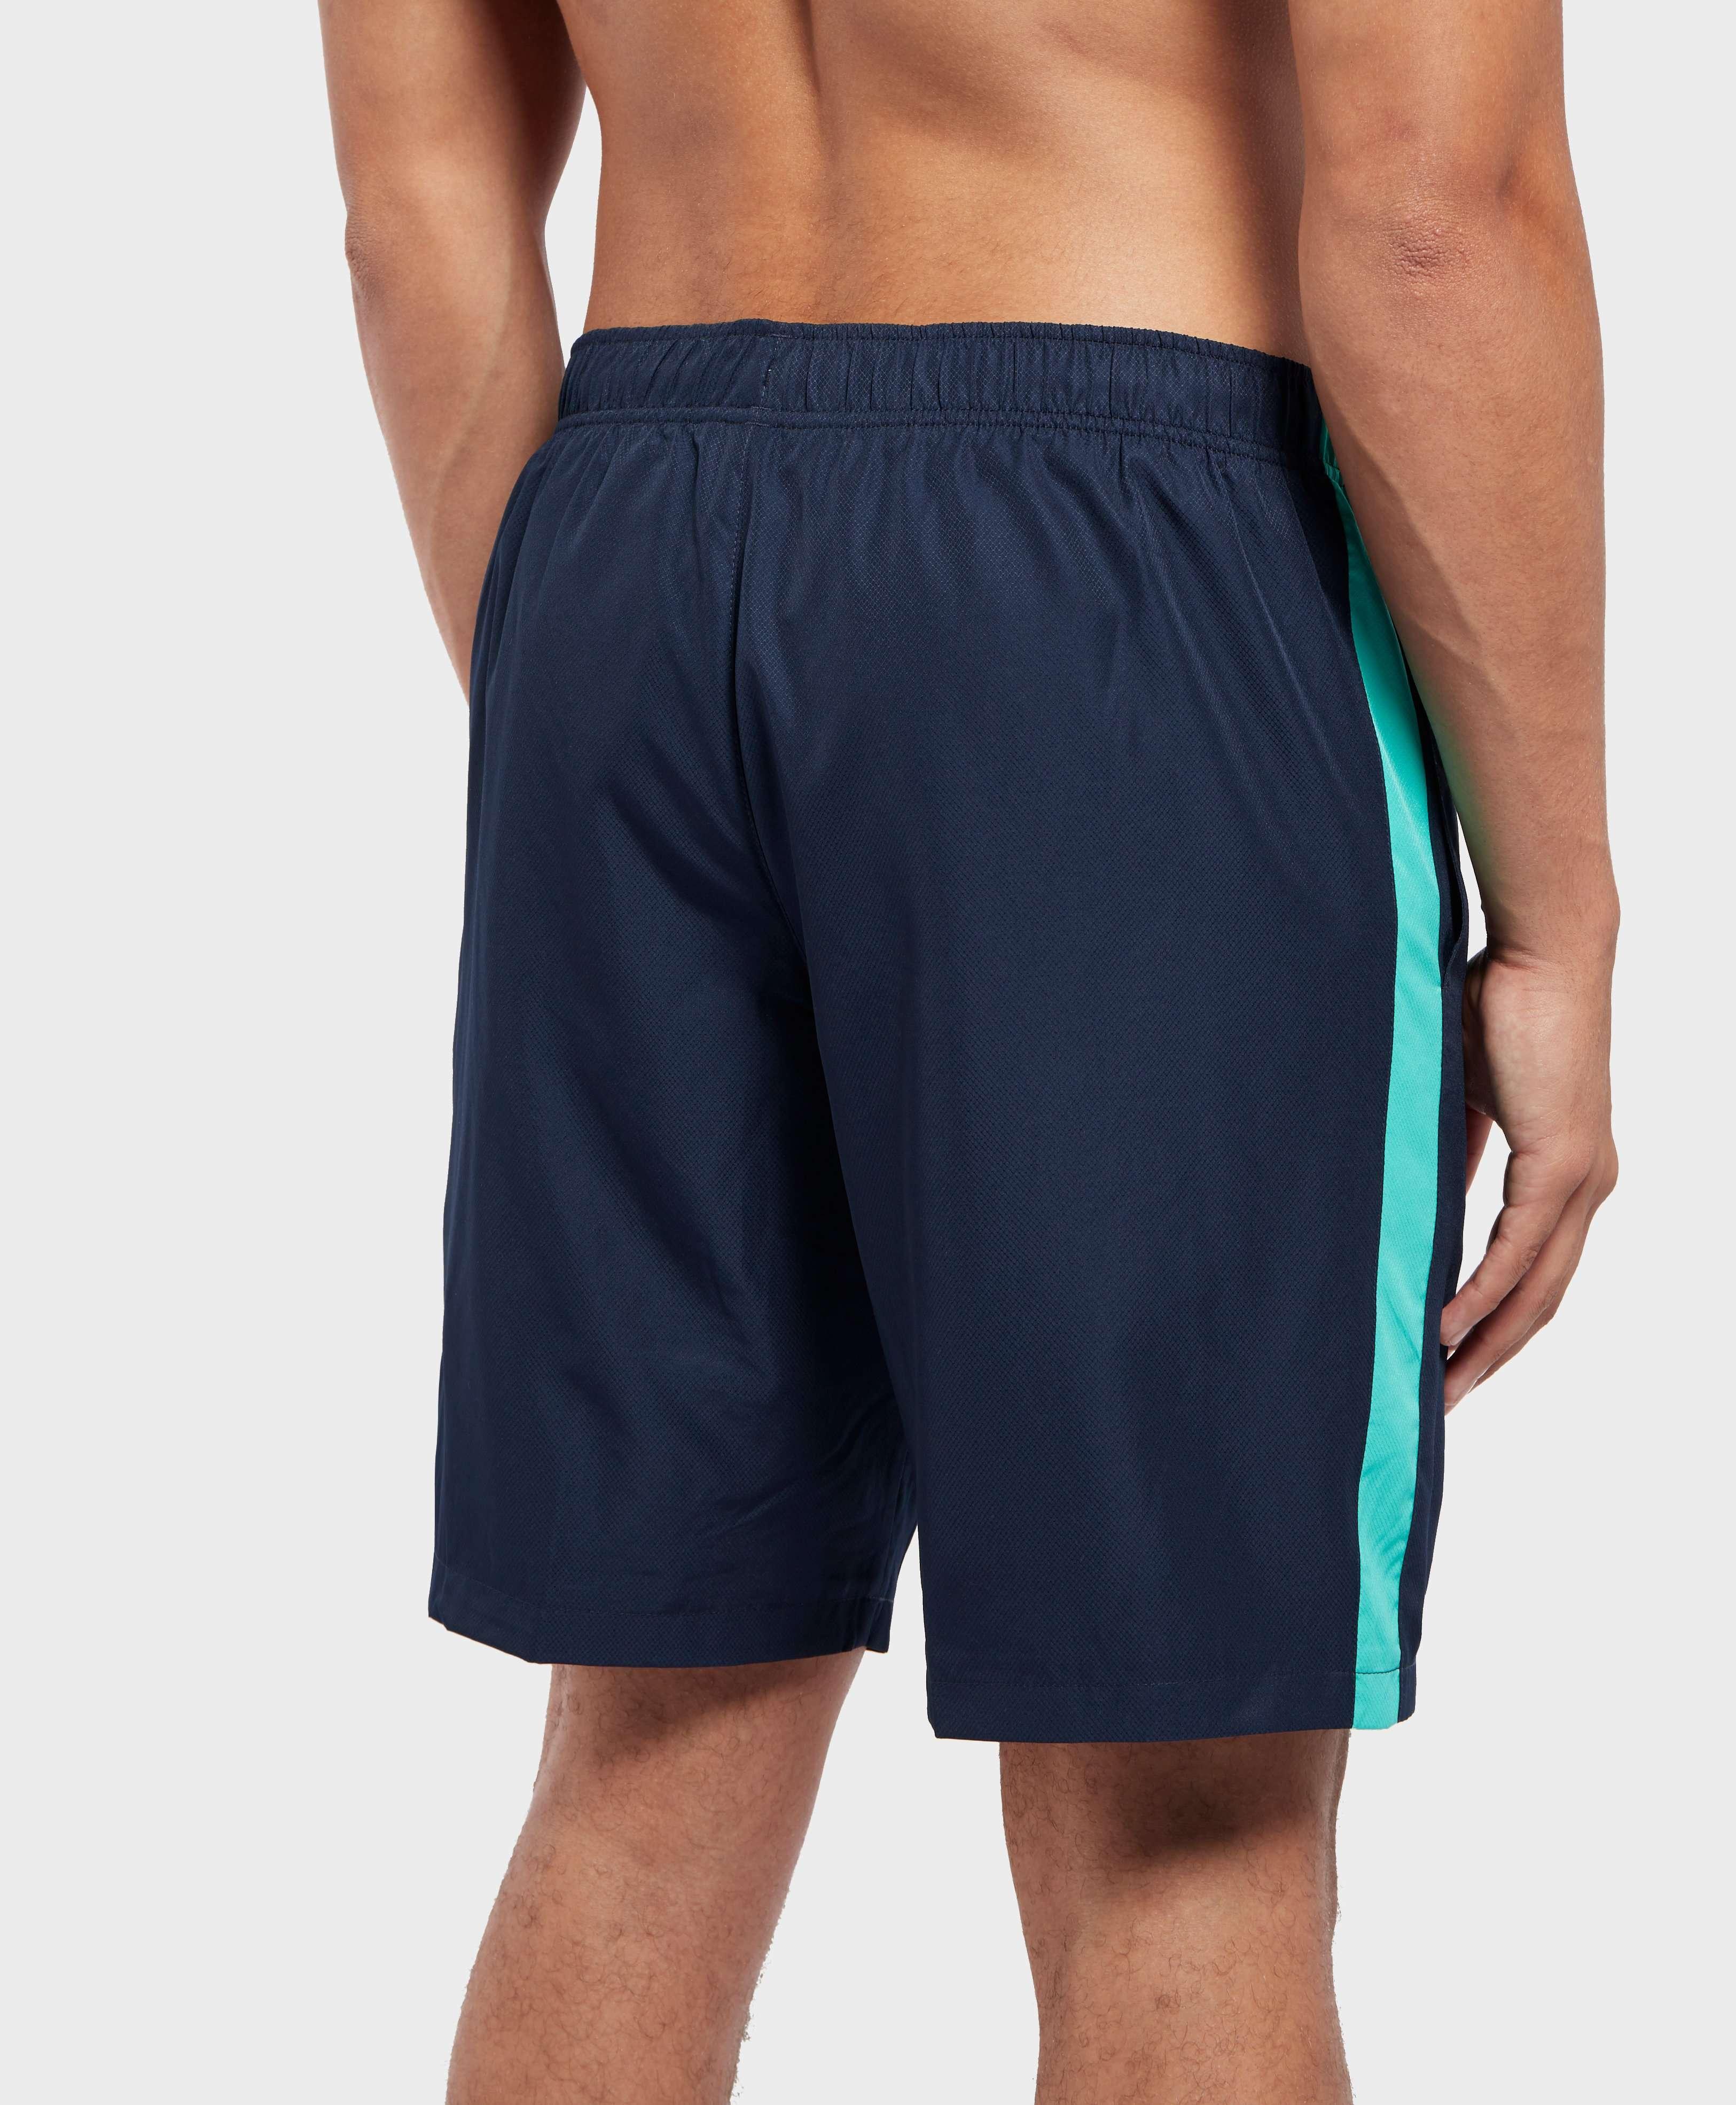 Lacoste Taffeta Trim Shorts